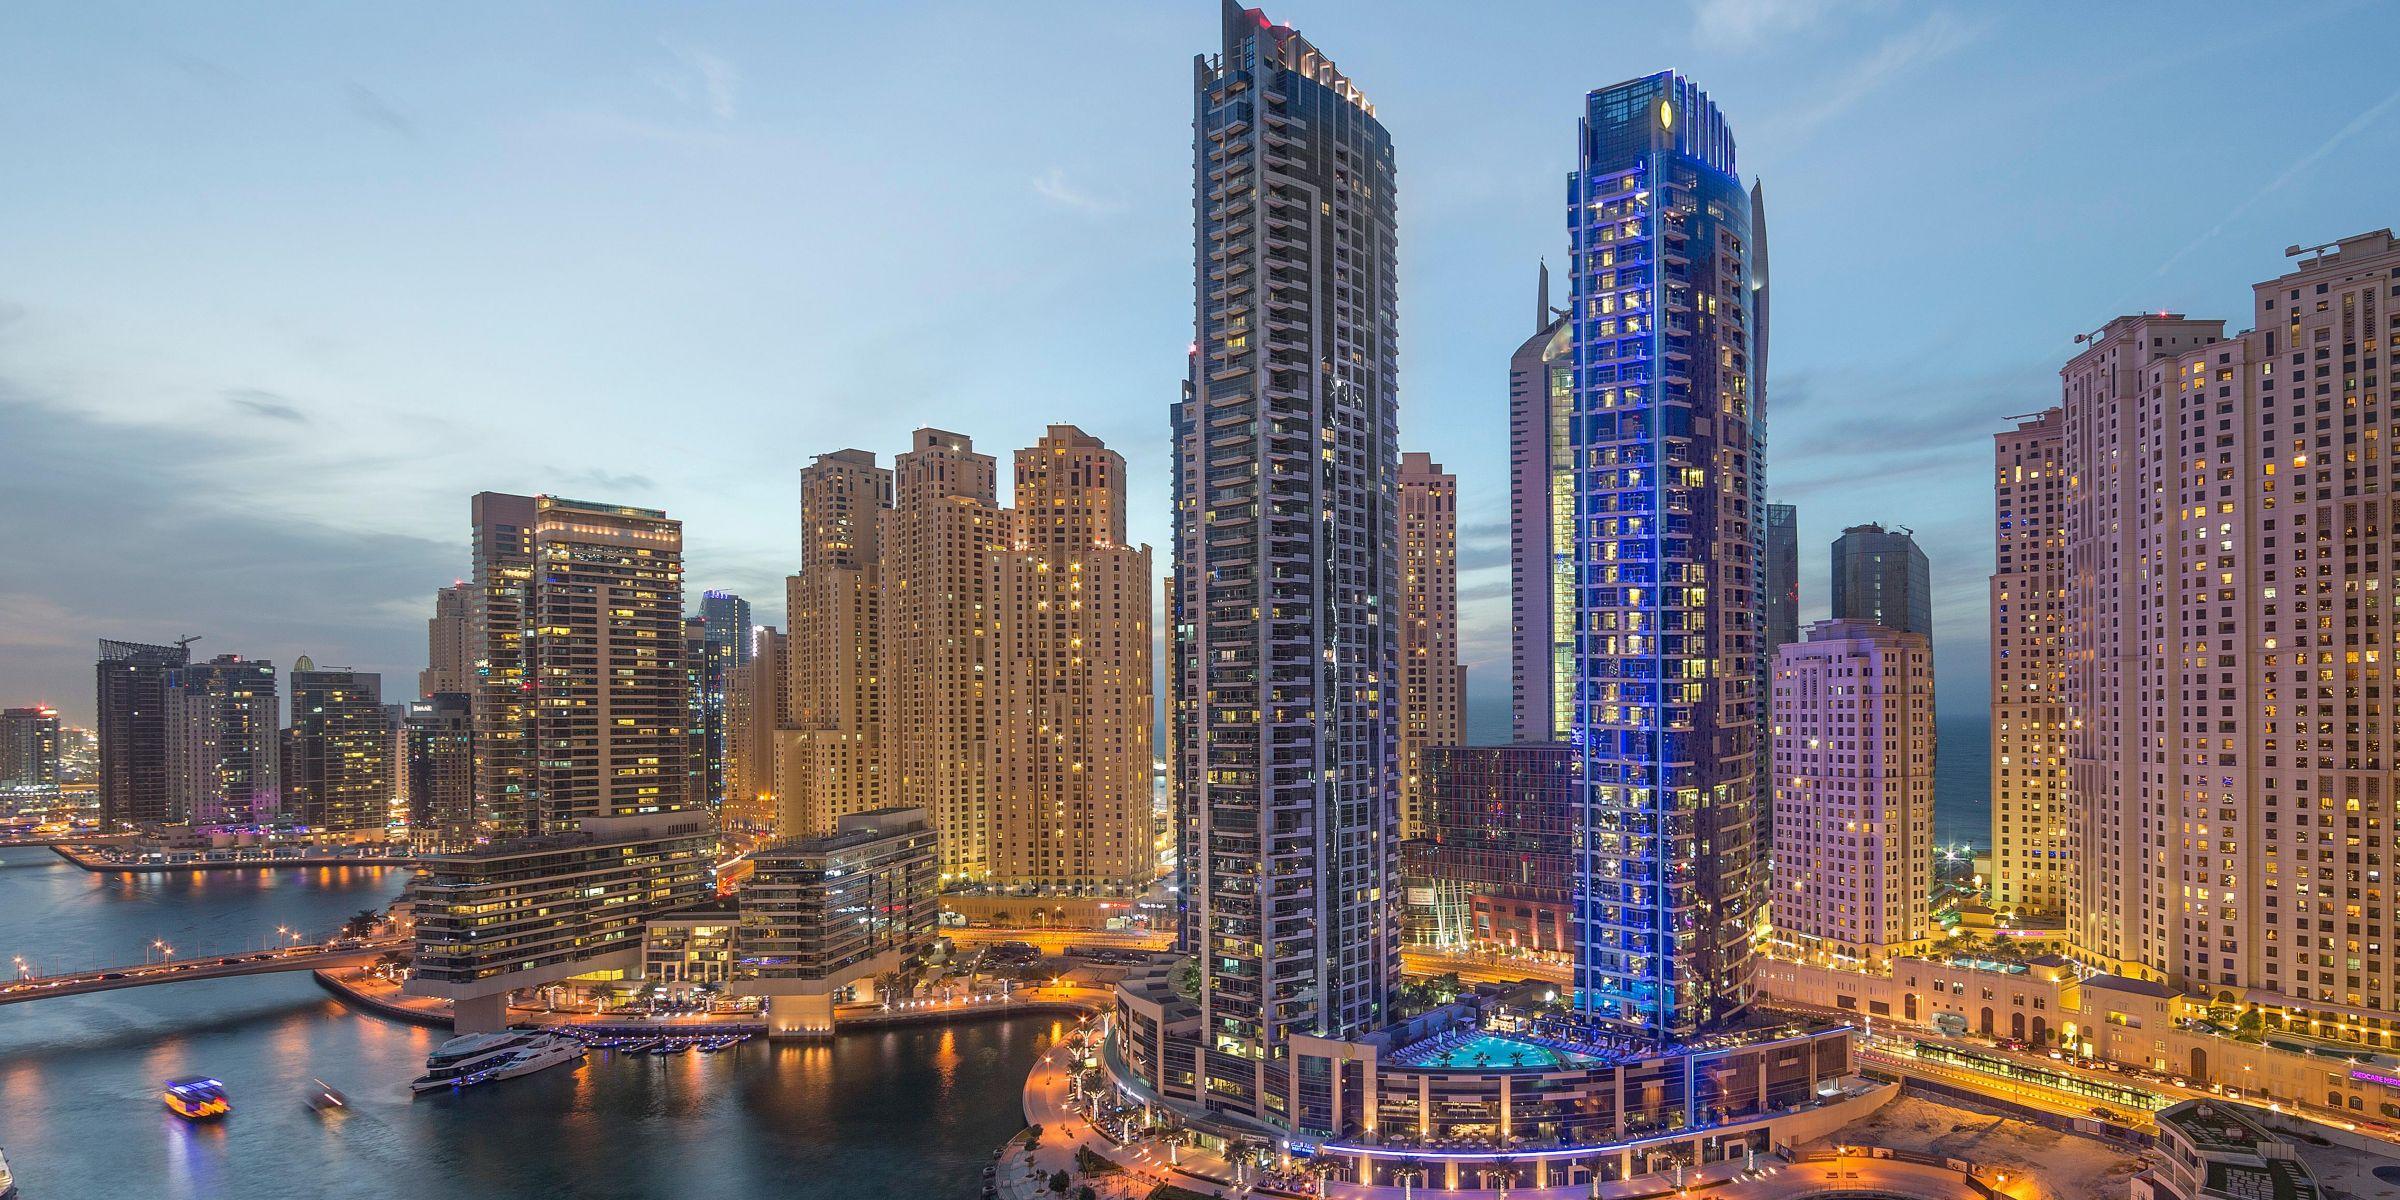 dubai intercontinental hotel 2018 world 39 s best hotels. Black Bedroom Furniture Sets. Home Design Ideas